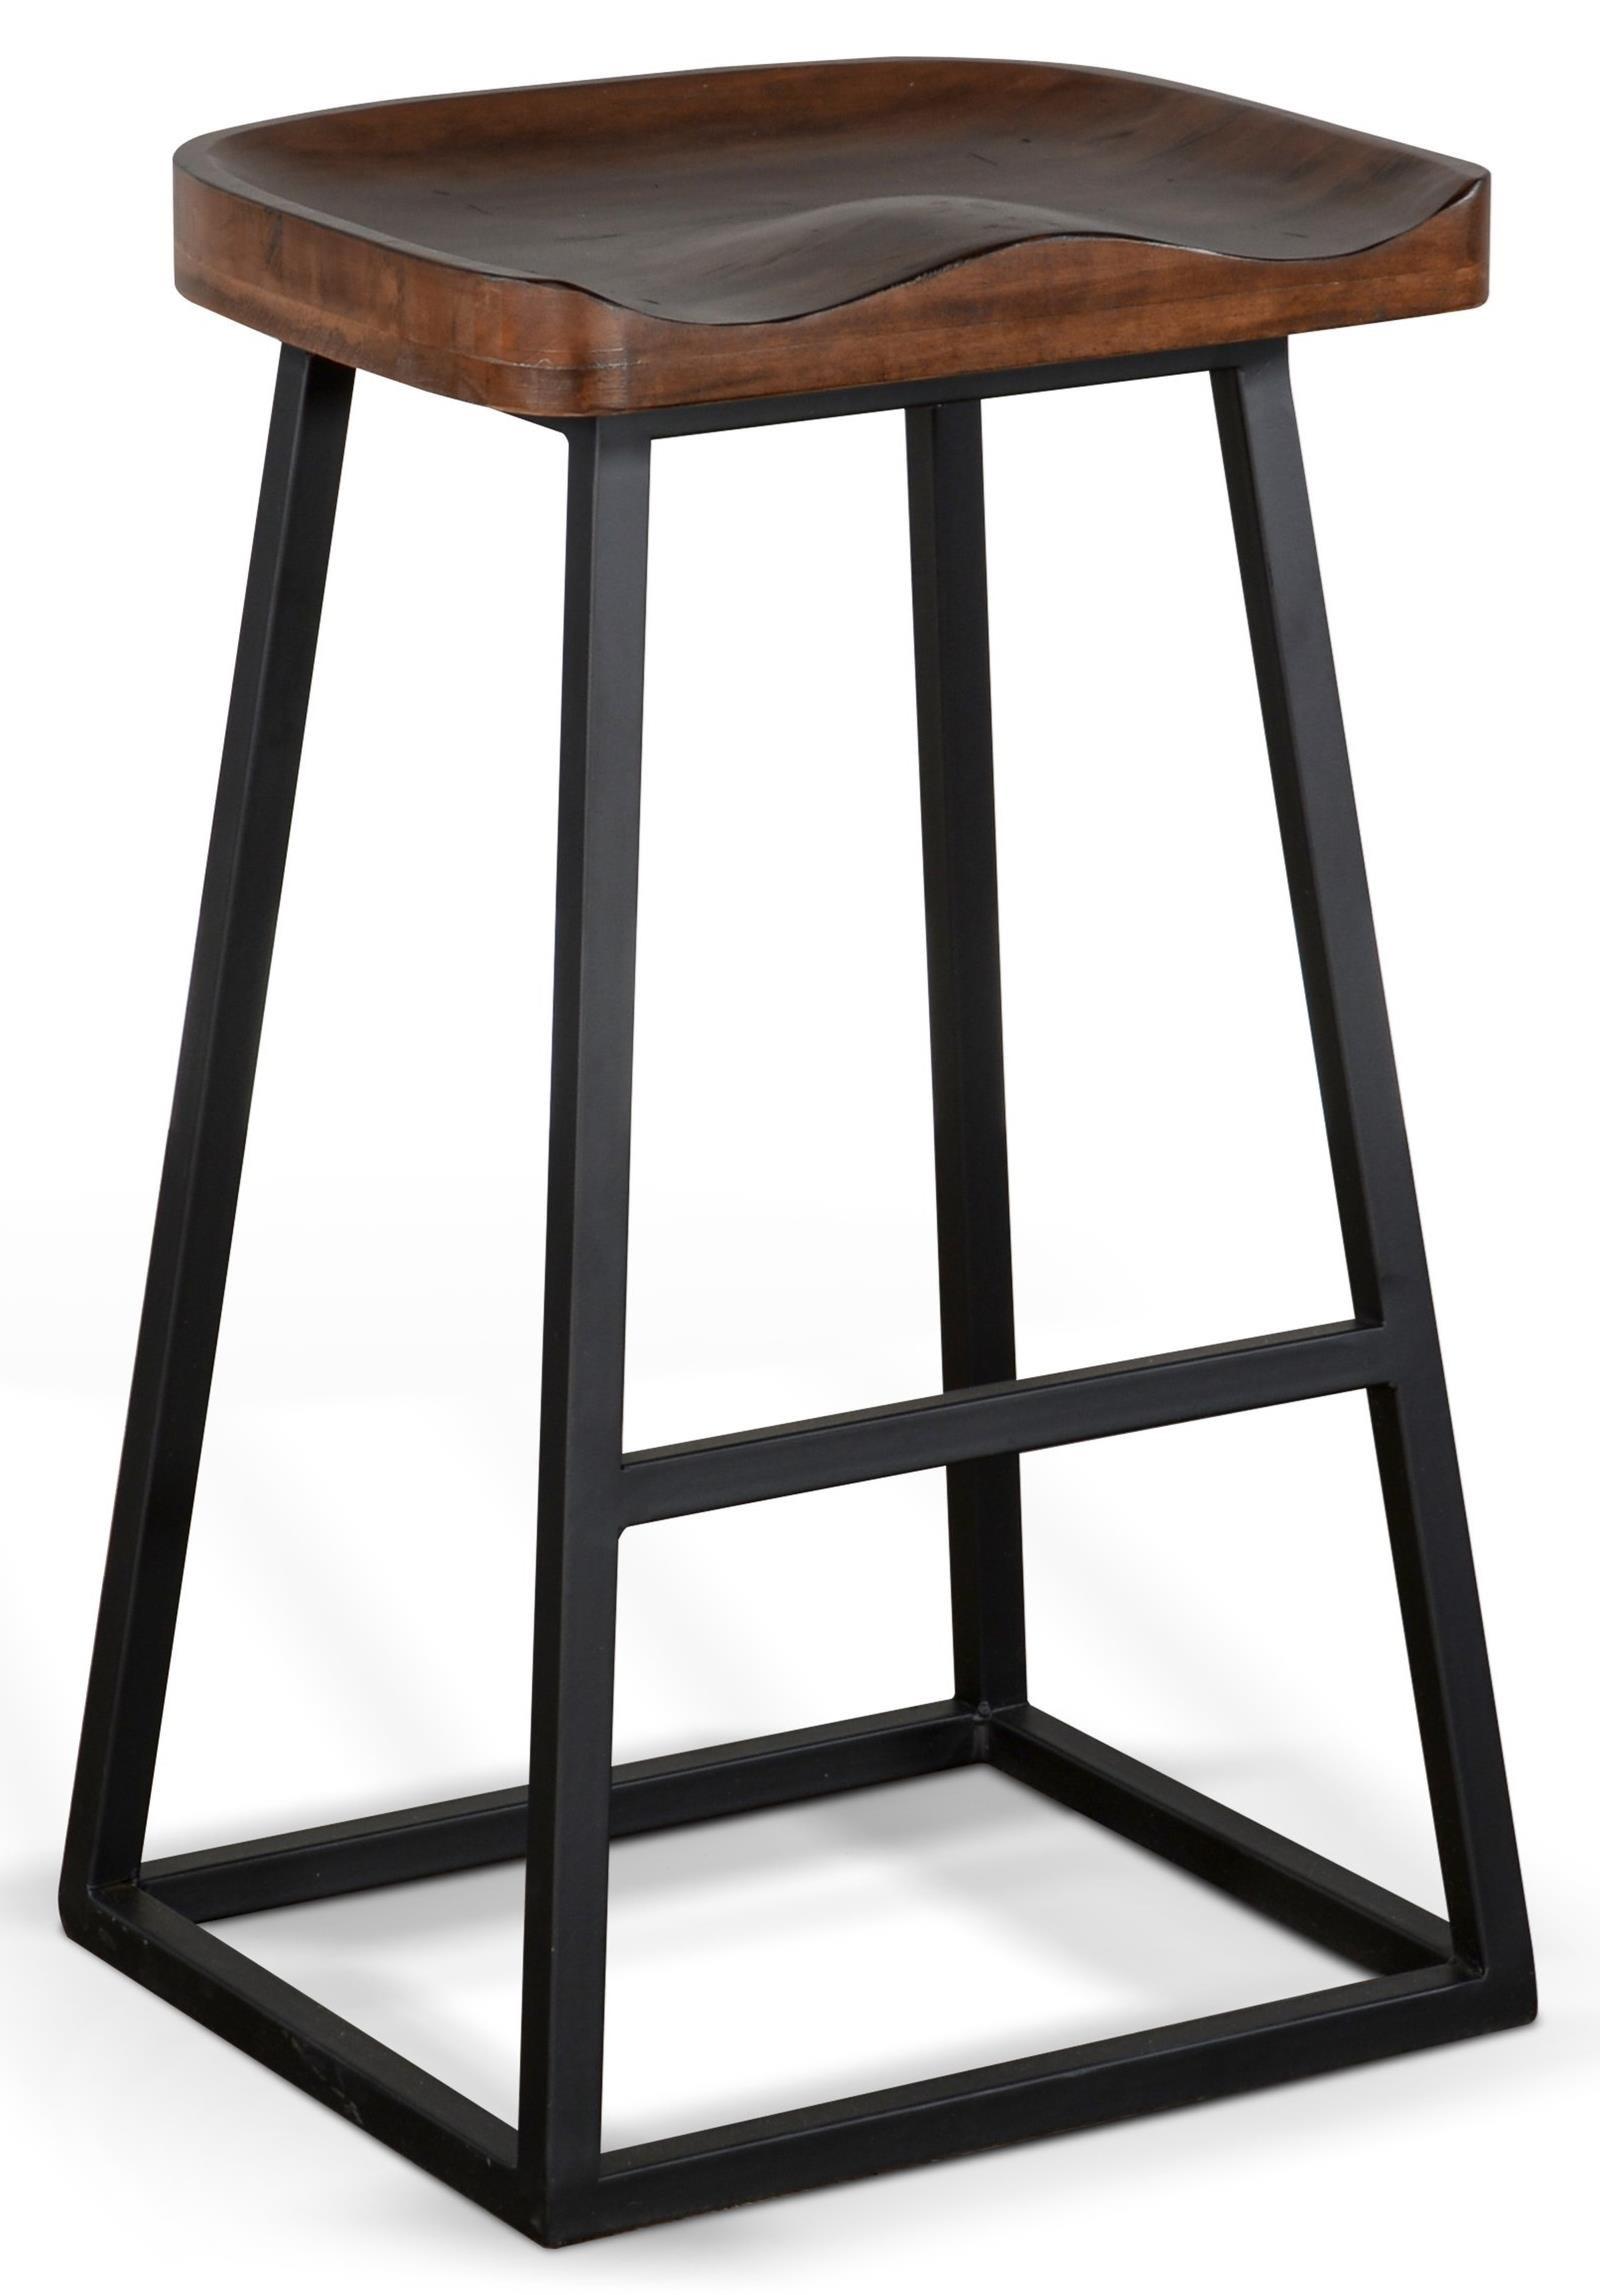 Bar Stool with Wood Saddle Seat and Metal Base